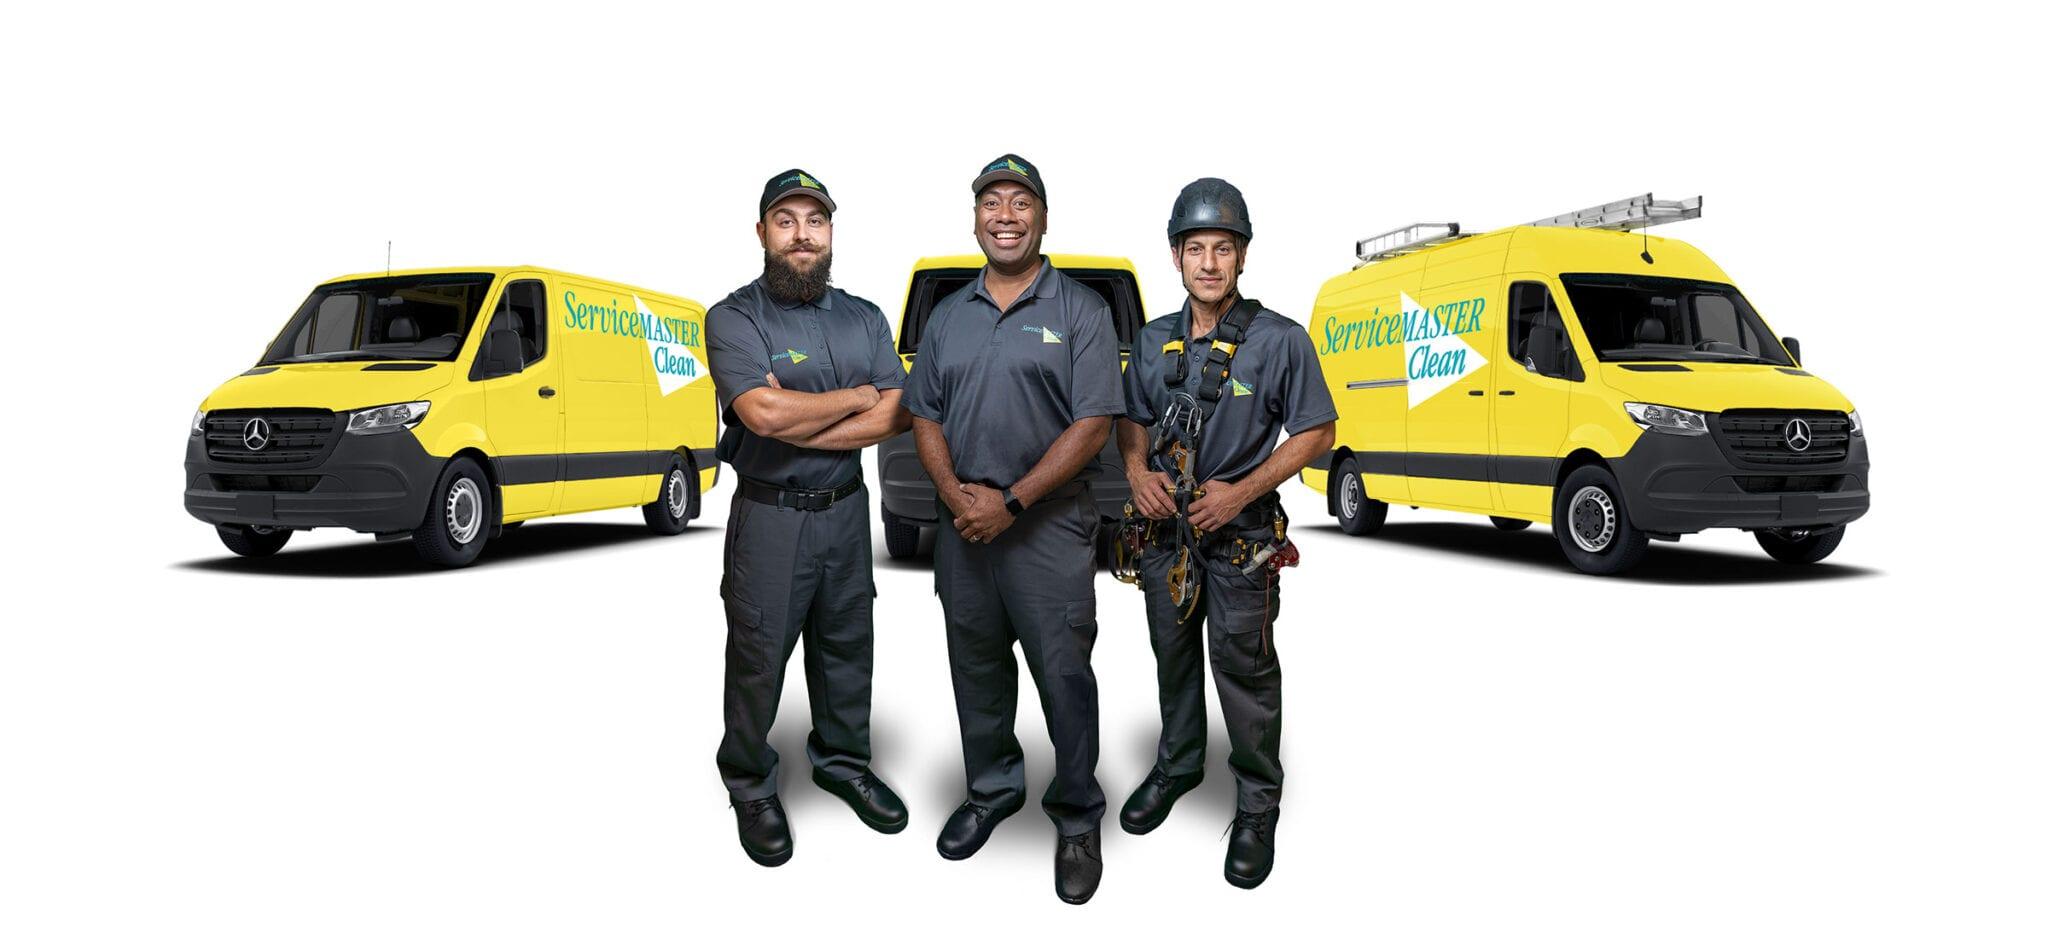 ServiceMaster Clean Lower Mainland Hero